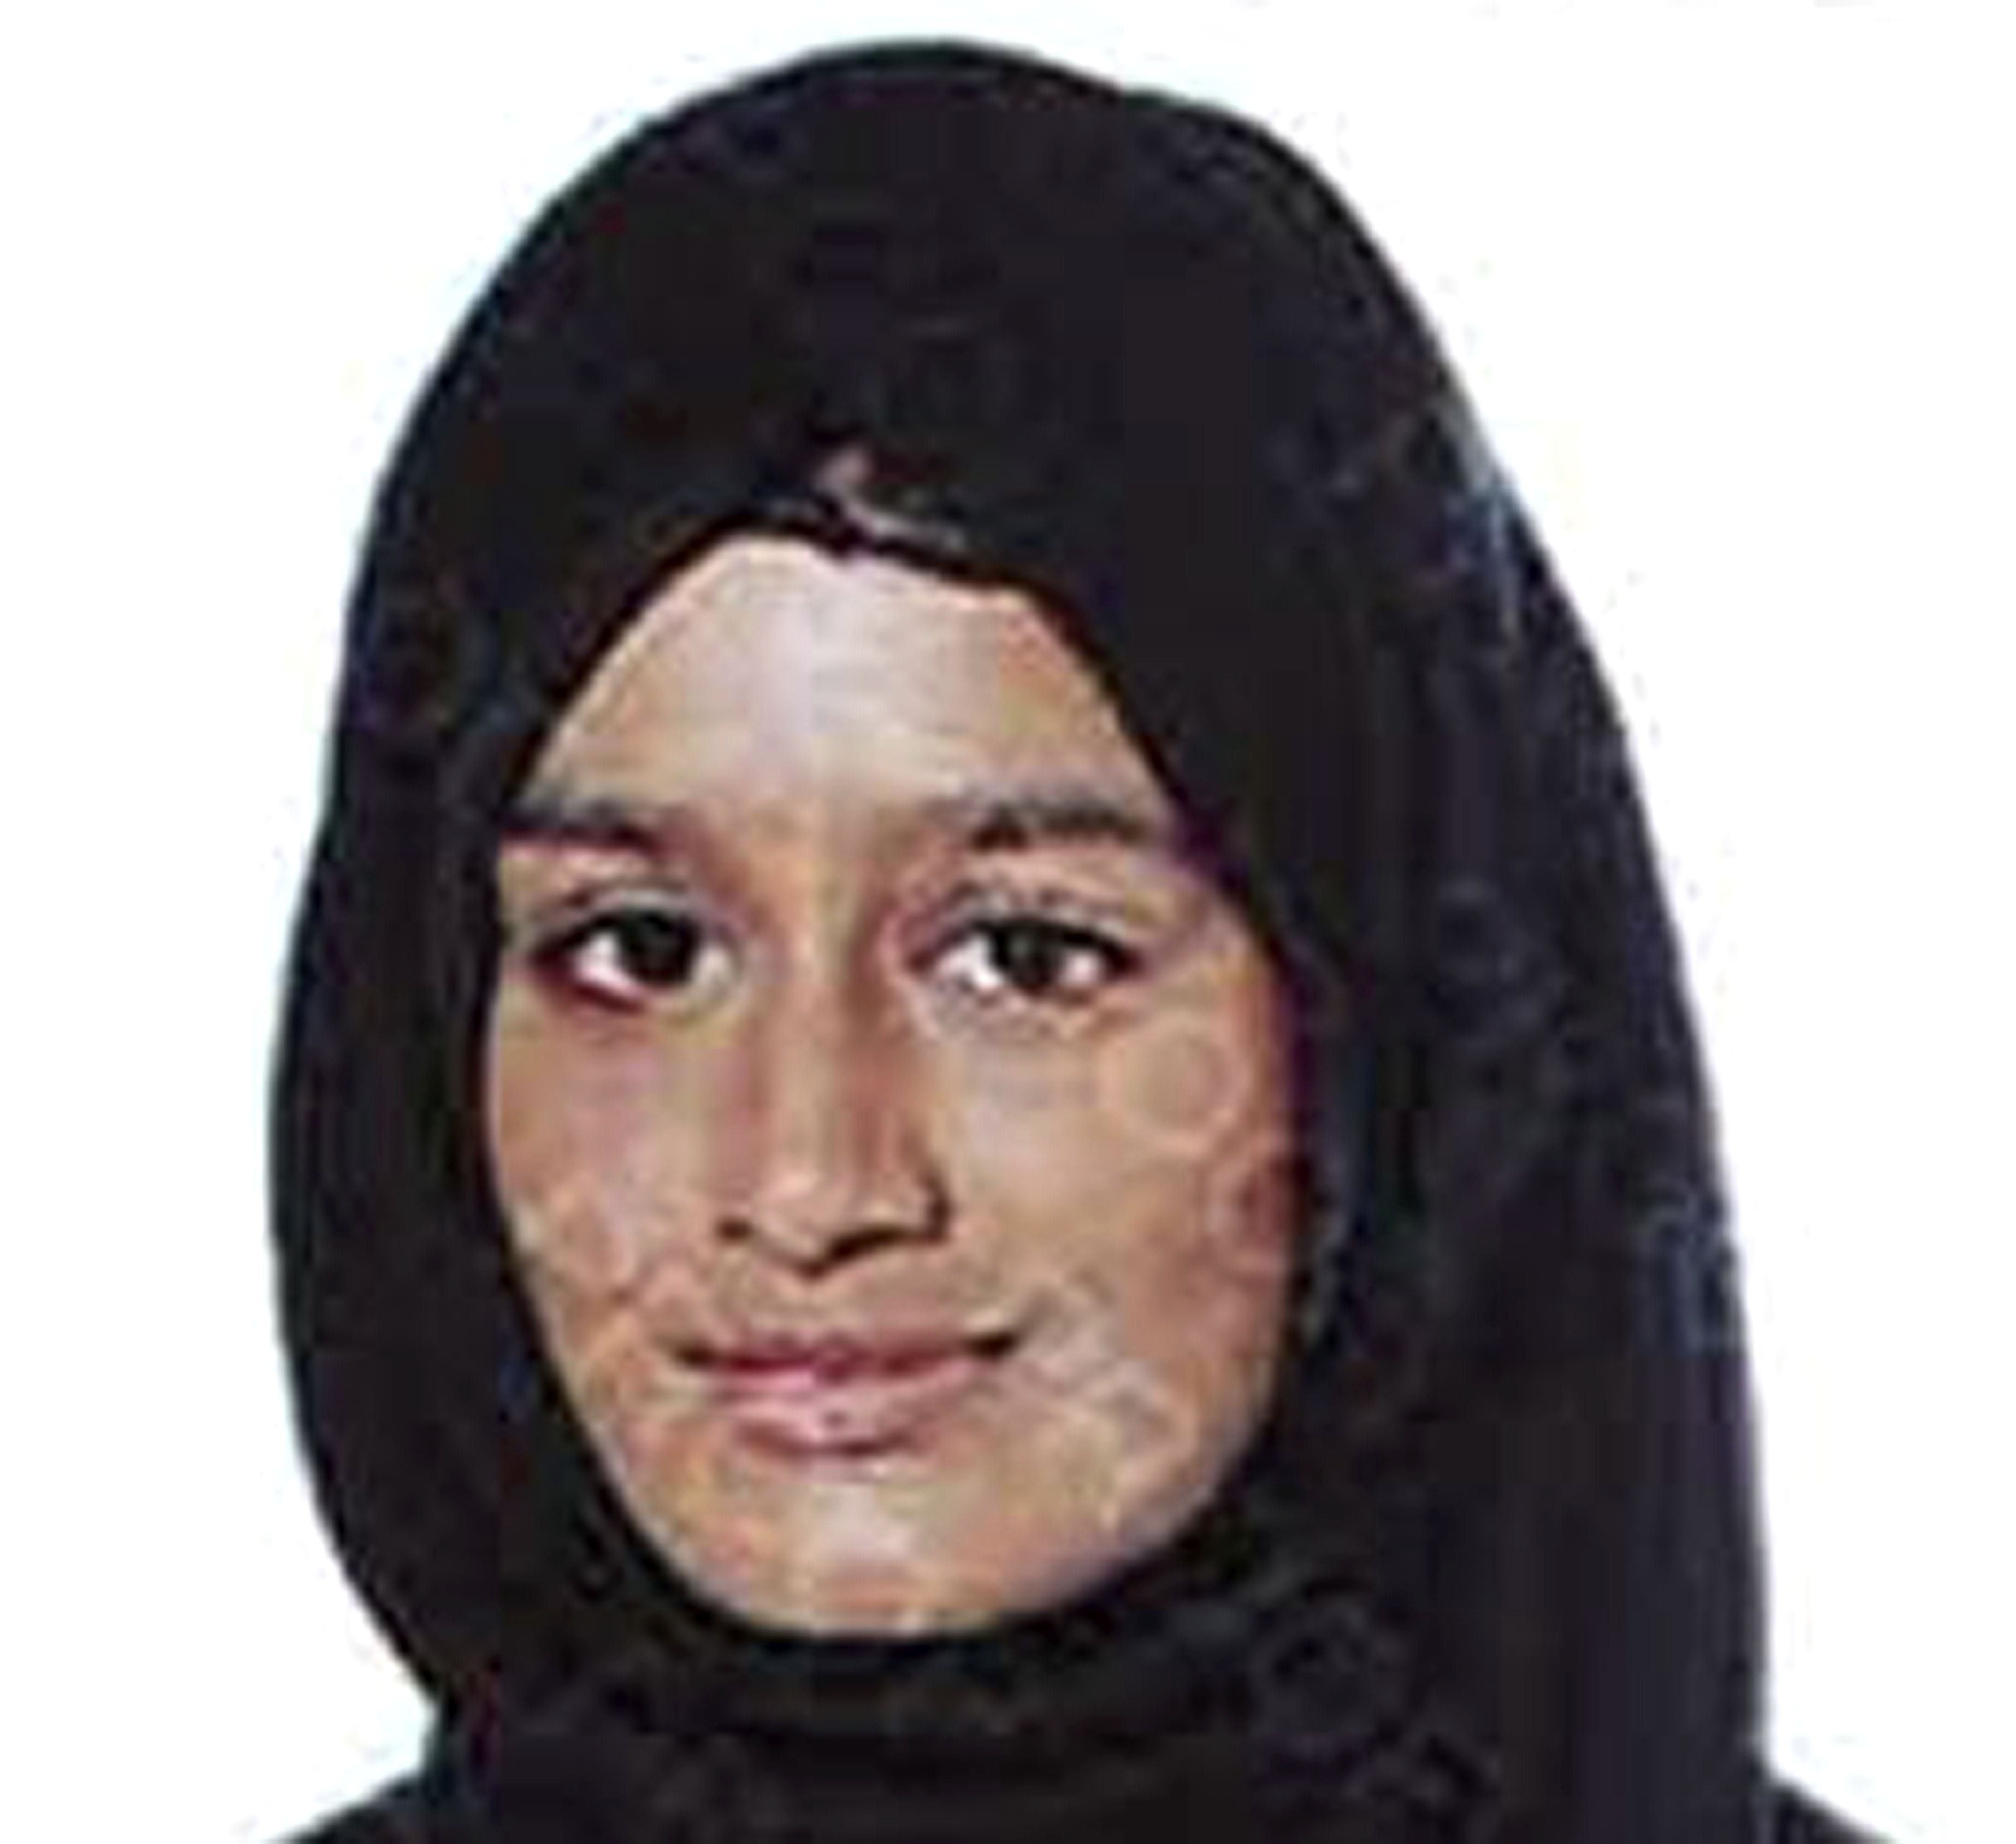 UK to Use Loophole to Revoke ISIS Teen's Citizenship